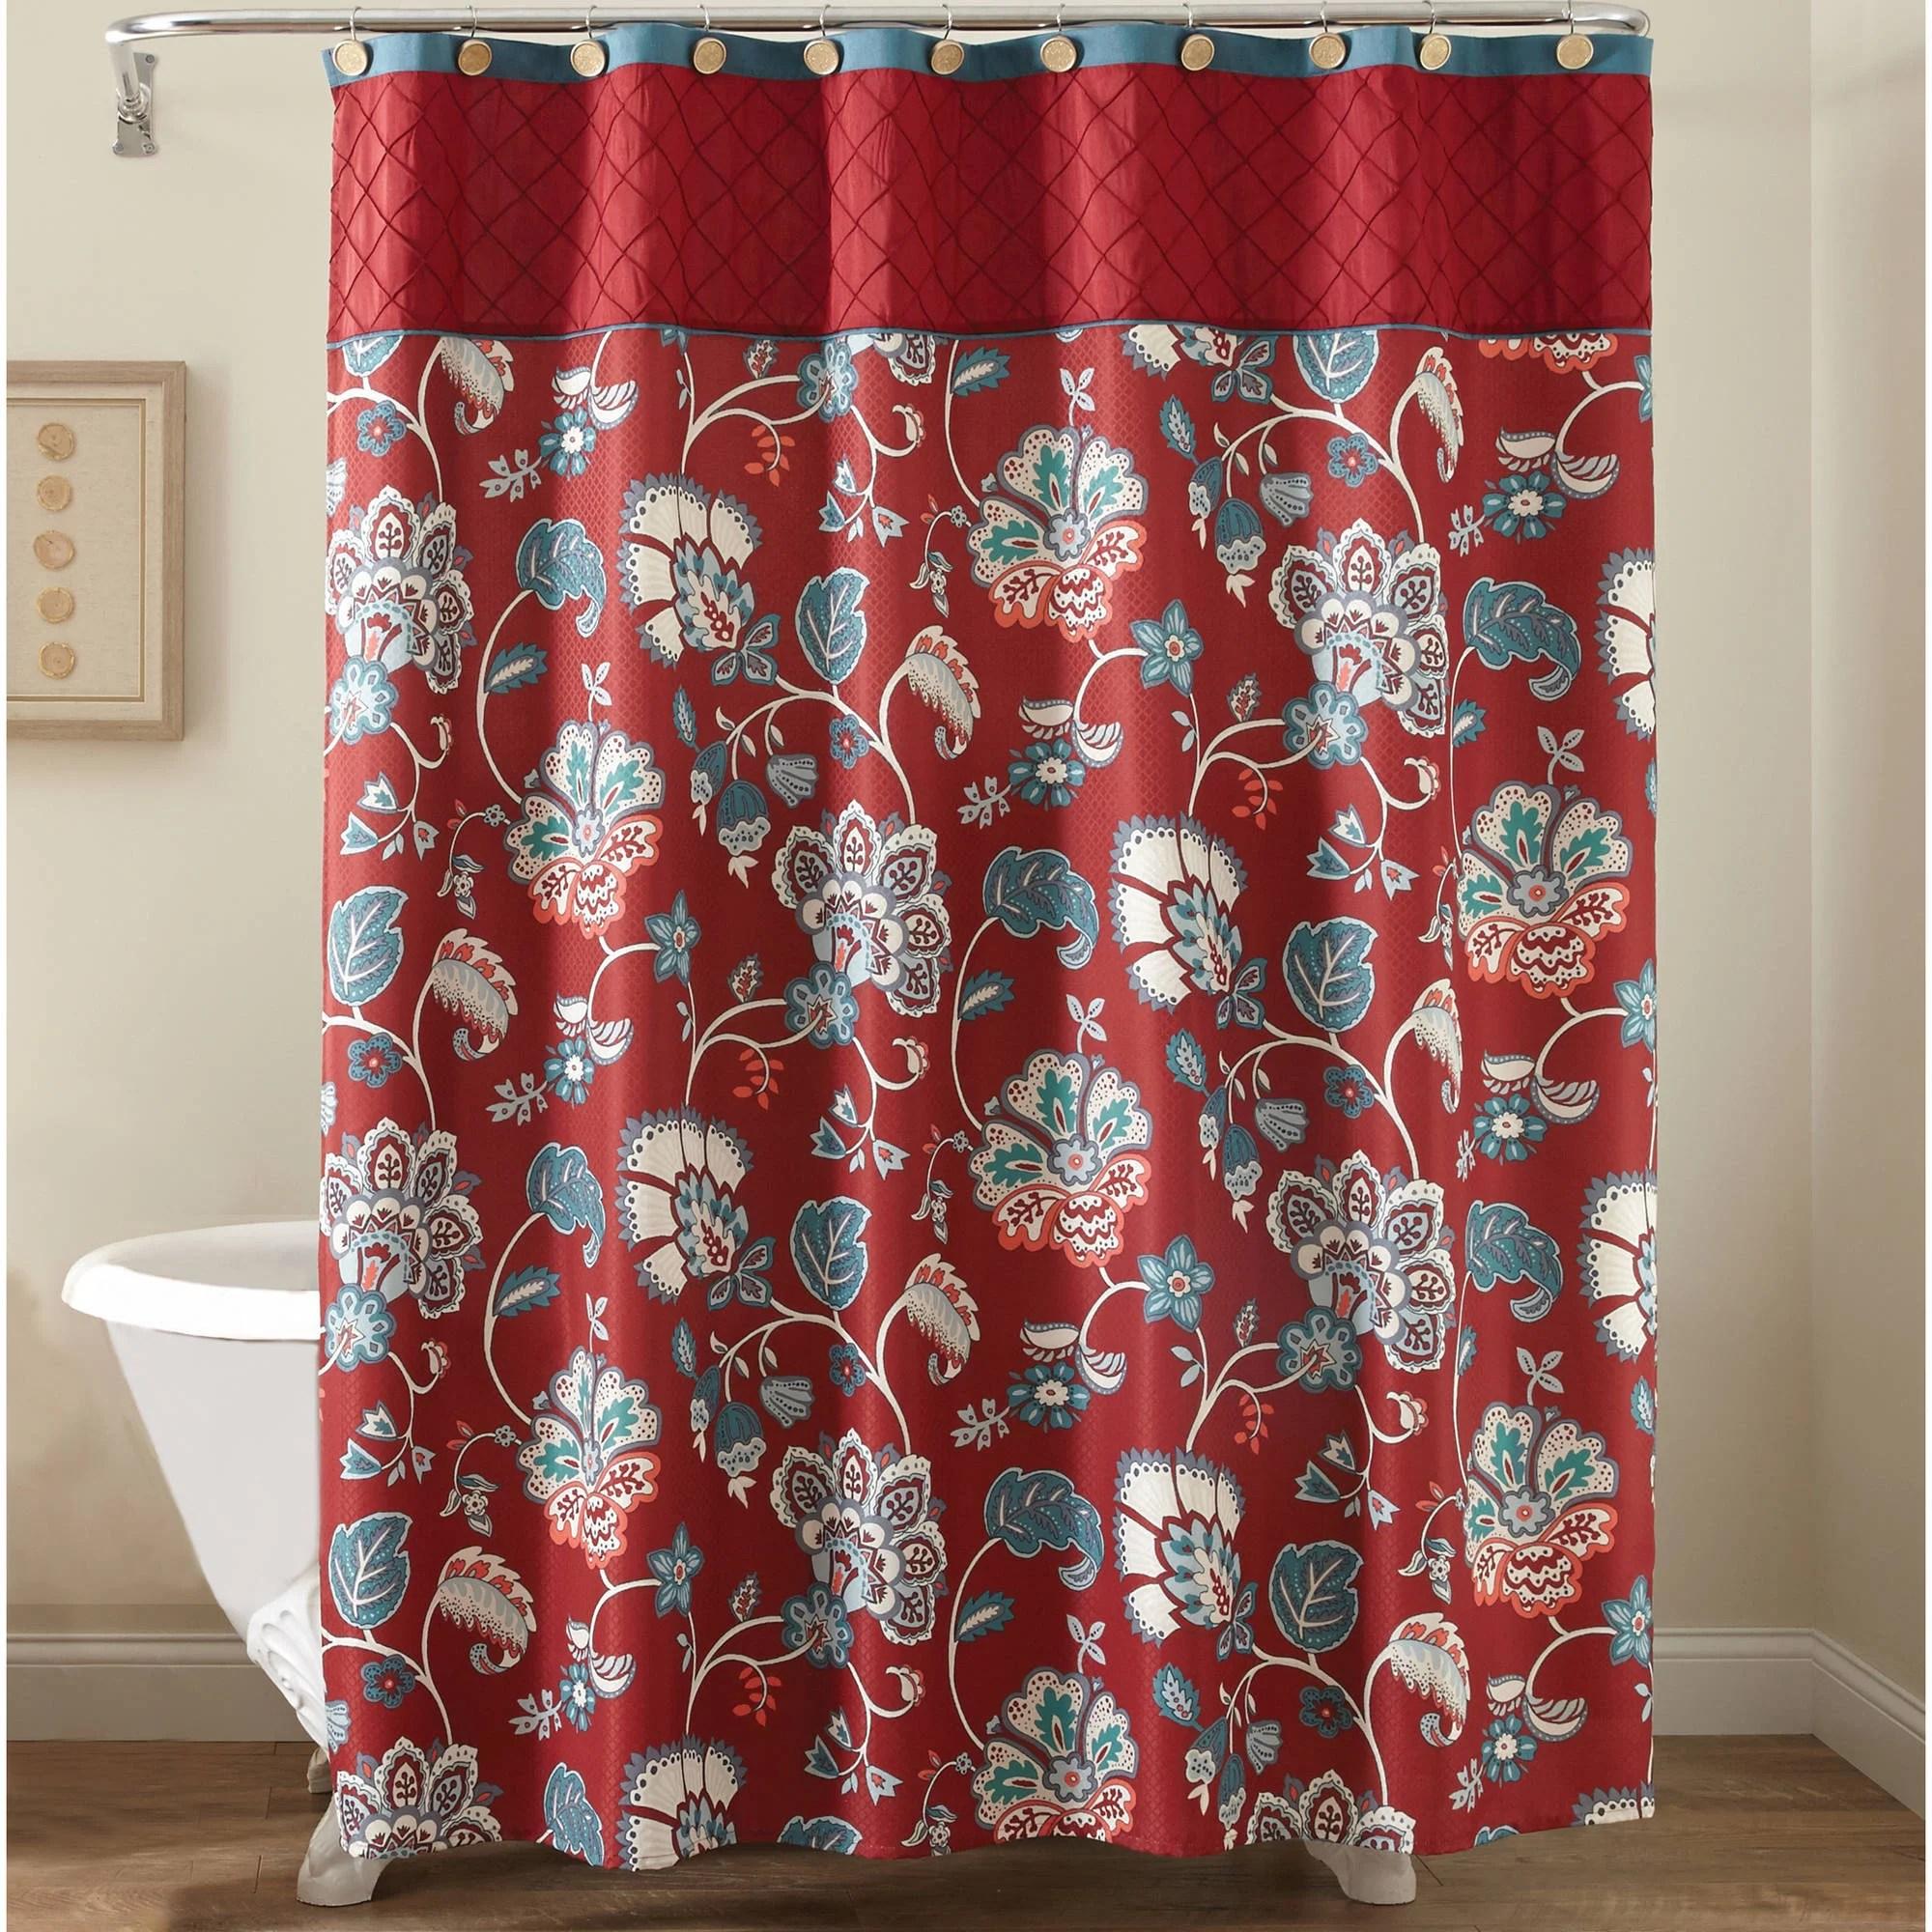 Better Homes  Gardens Polyester 72 x 72 Red Jacobean Fabric Shower Curtain 1 Each  Walmartcom